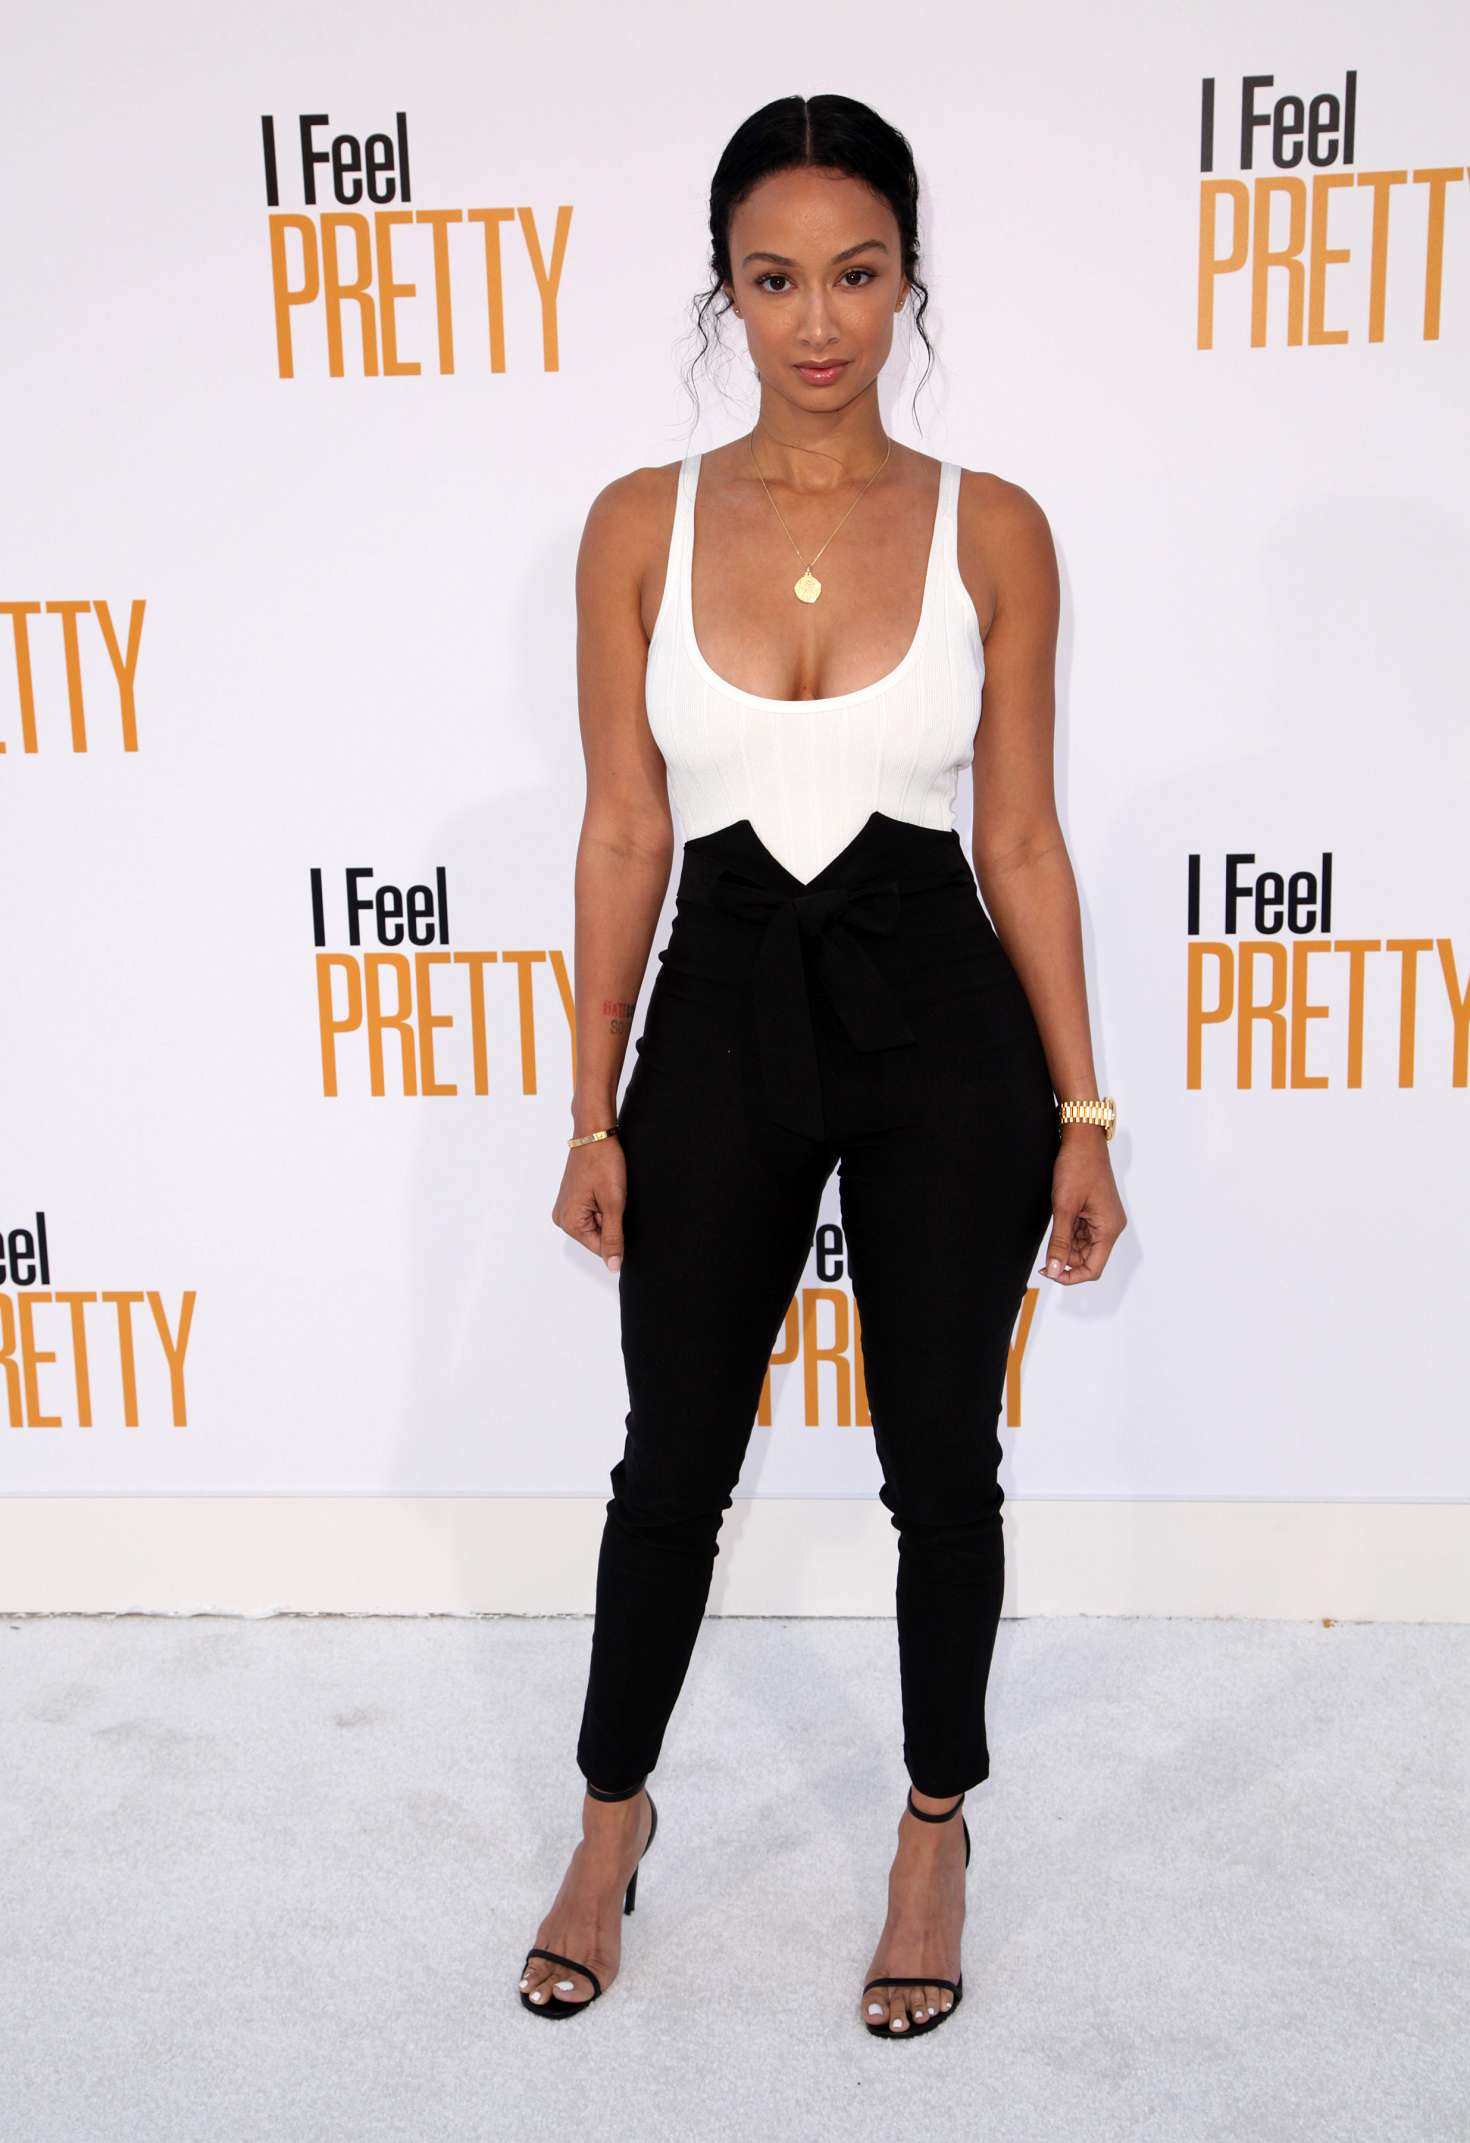 Draya Michele 2018 : Draya Michele: I Feel Pretty Premiere -02